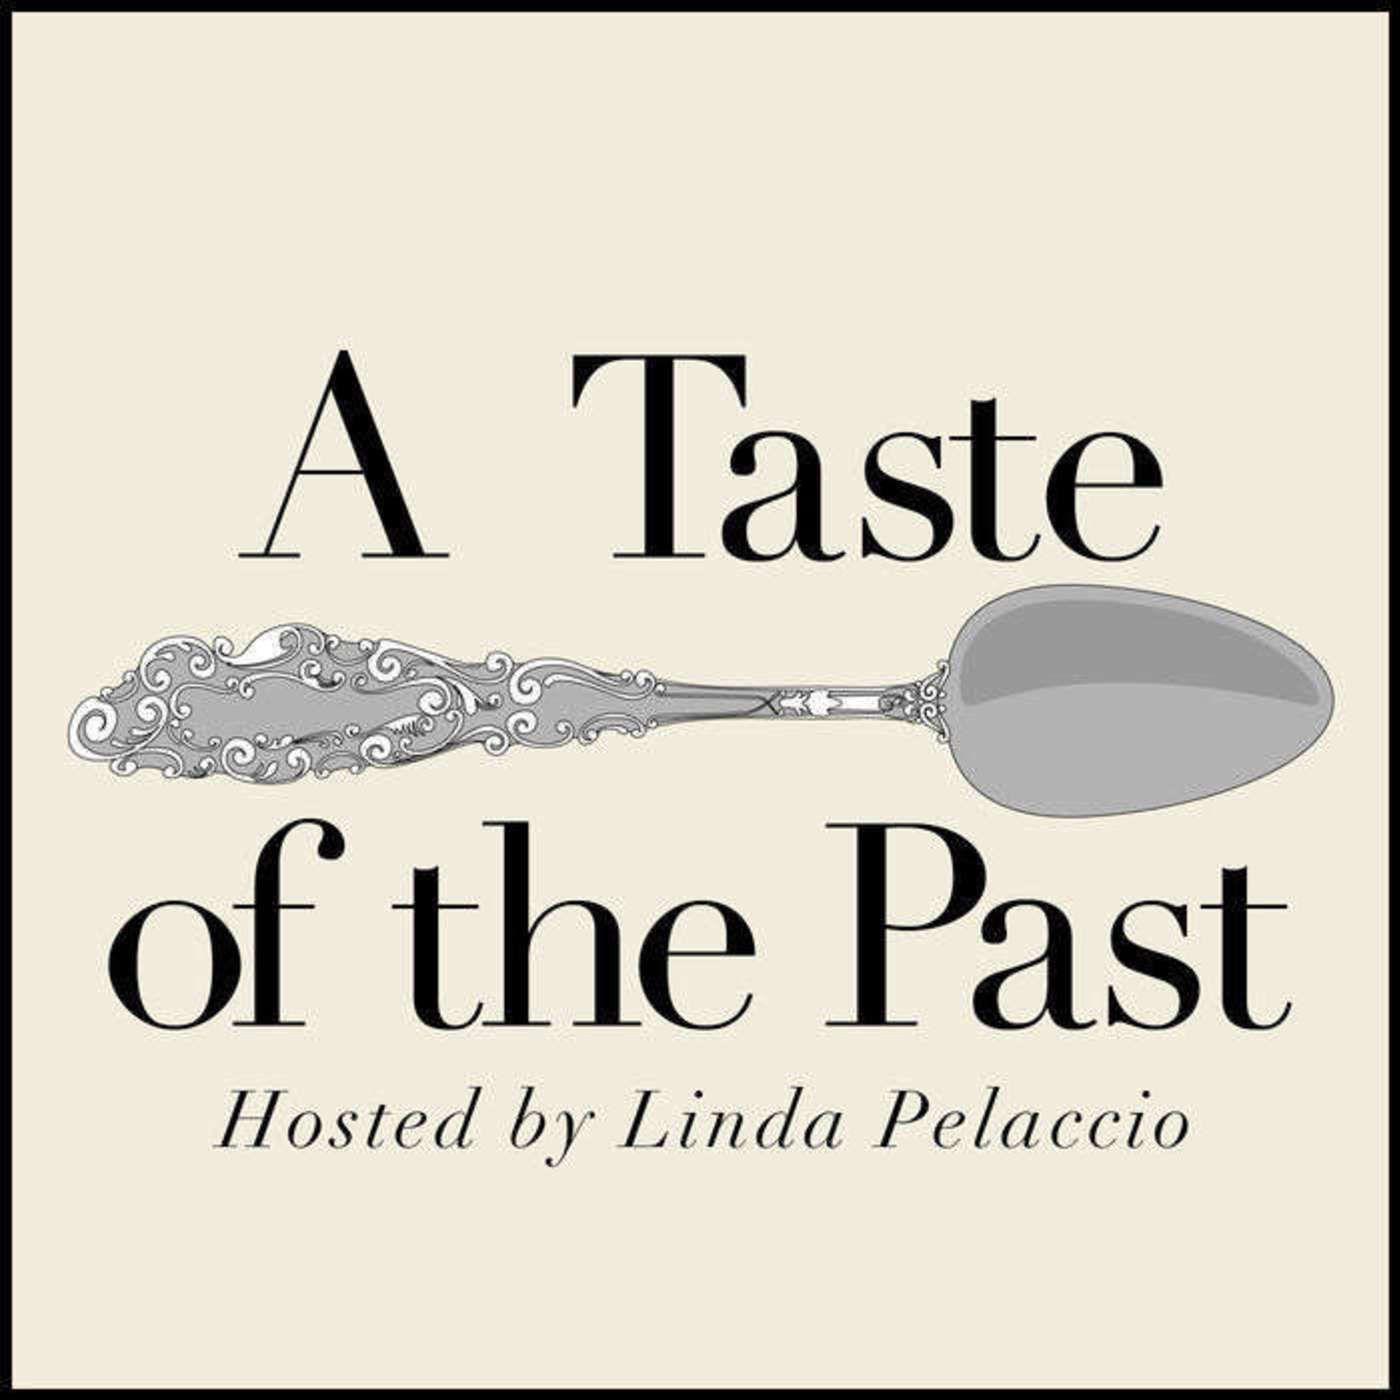 Episode 99: Milk Through the Ages